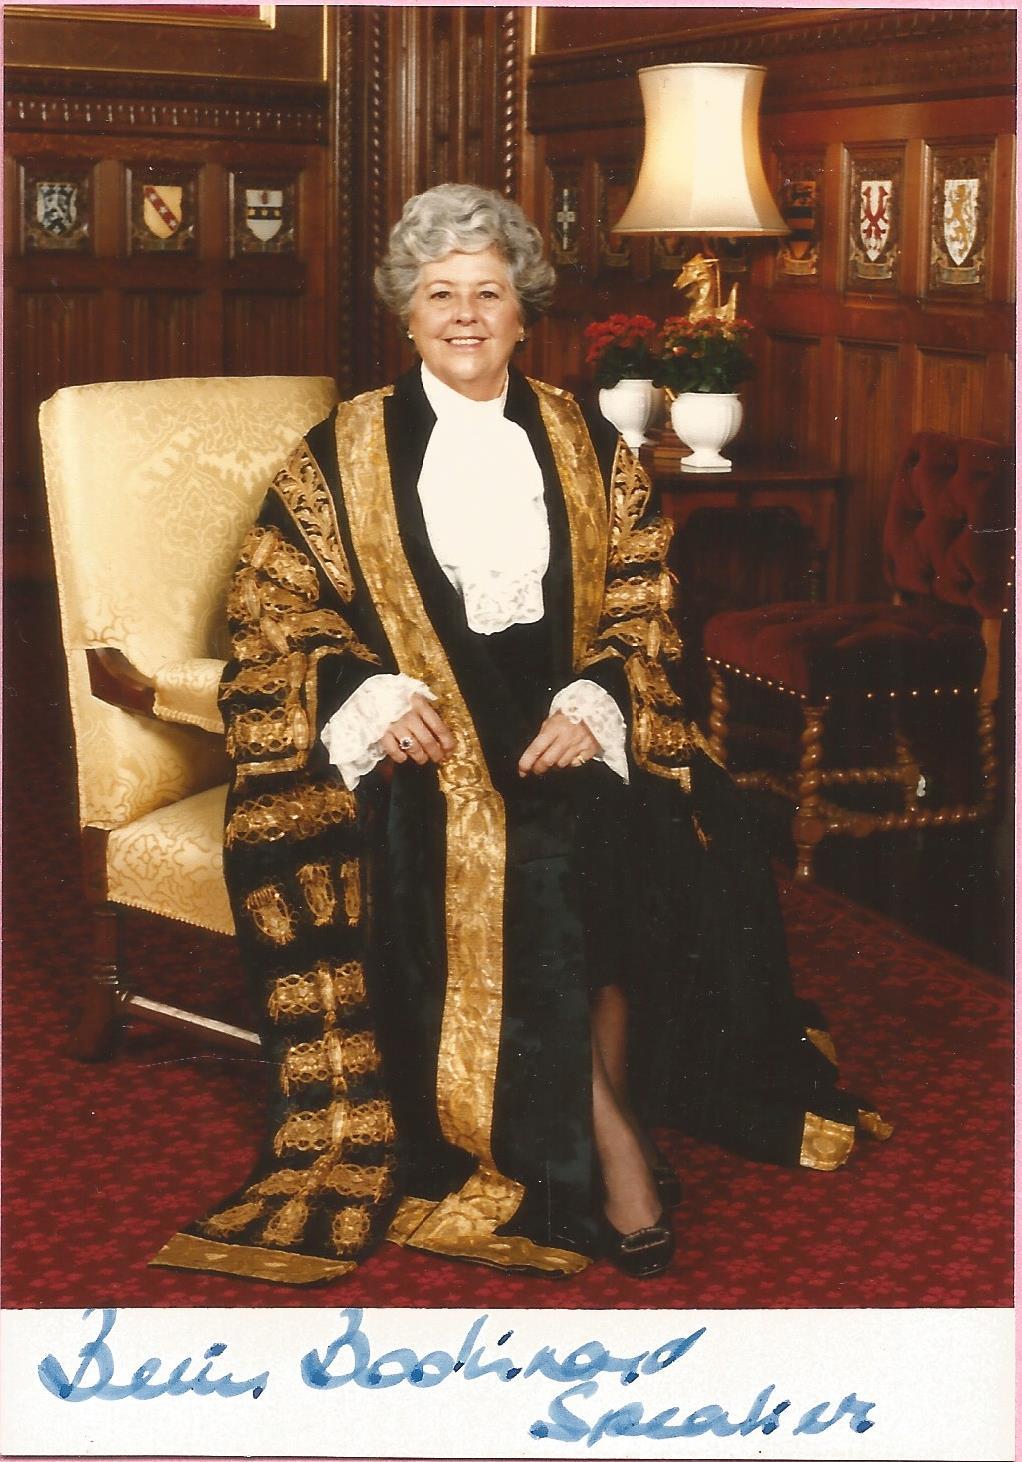 Betty Boothroyd signed 5x3 colour photo. Betty Boothroyd, Baroness Boothroyd OM, PC, Hon. FSLL (born